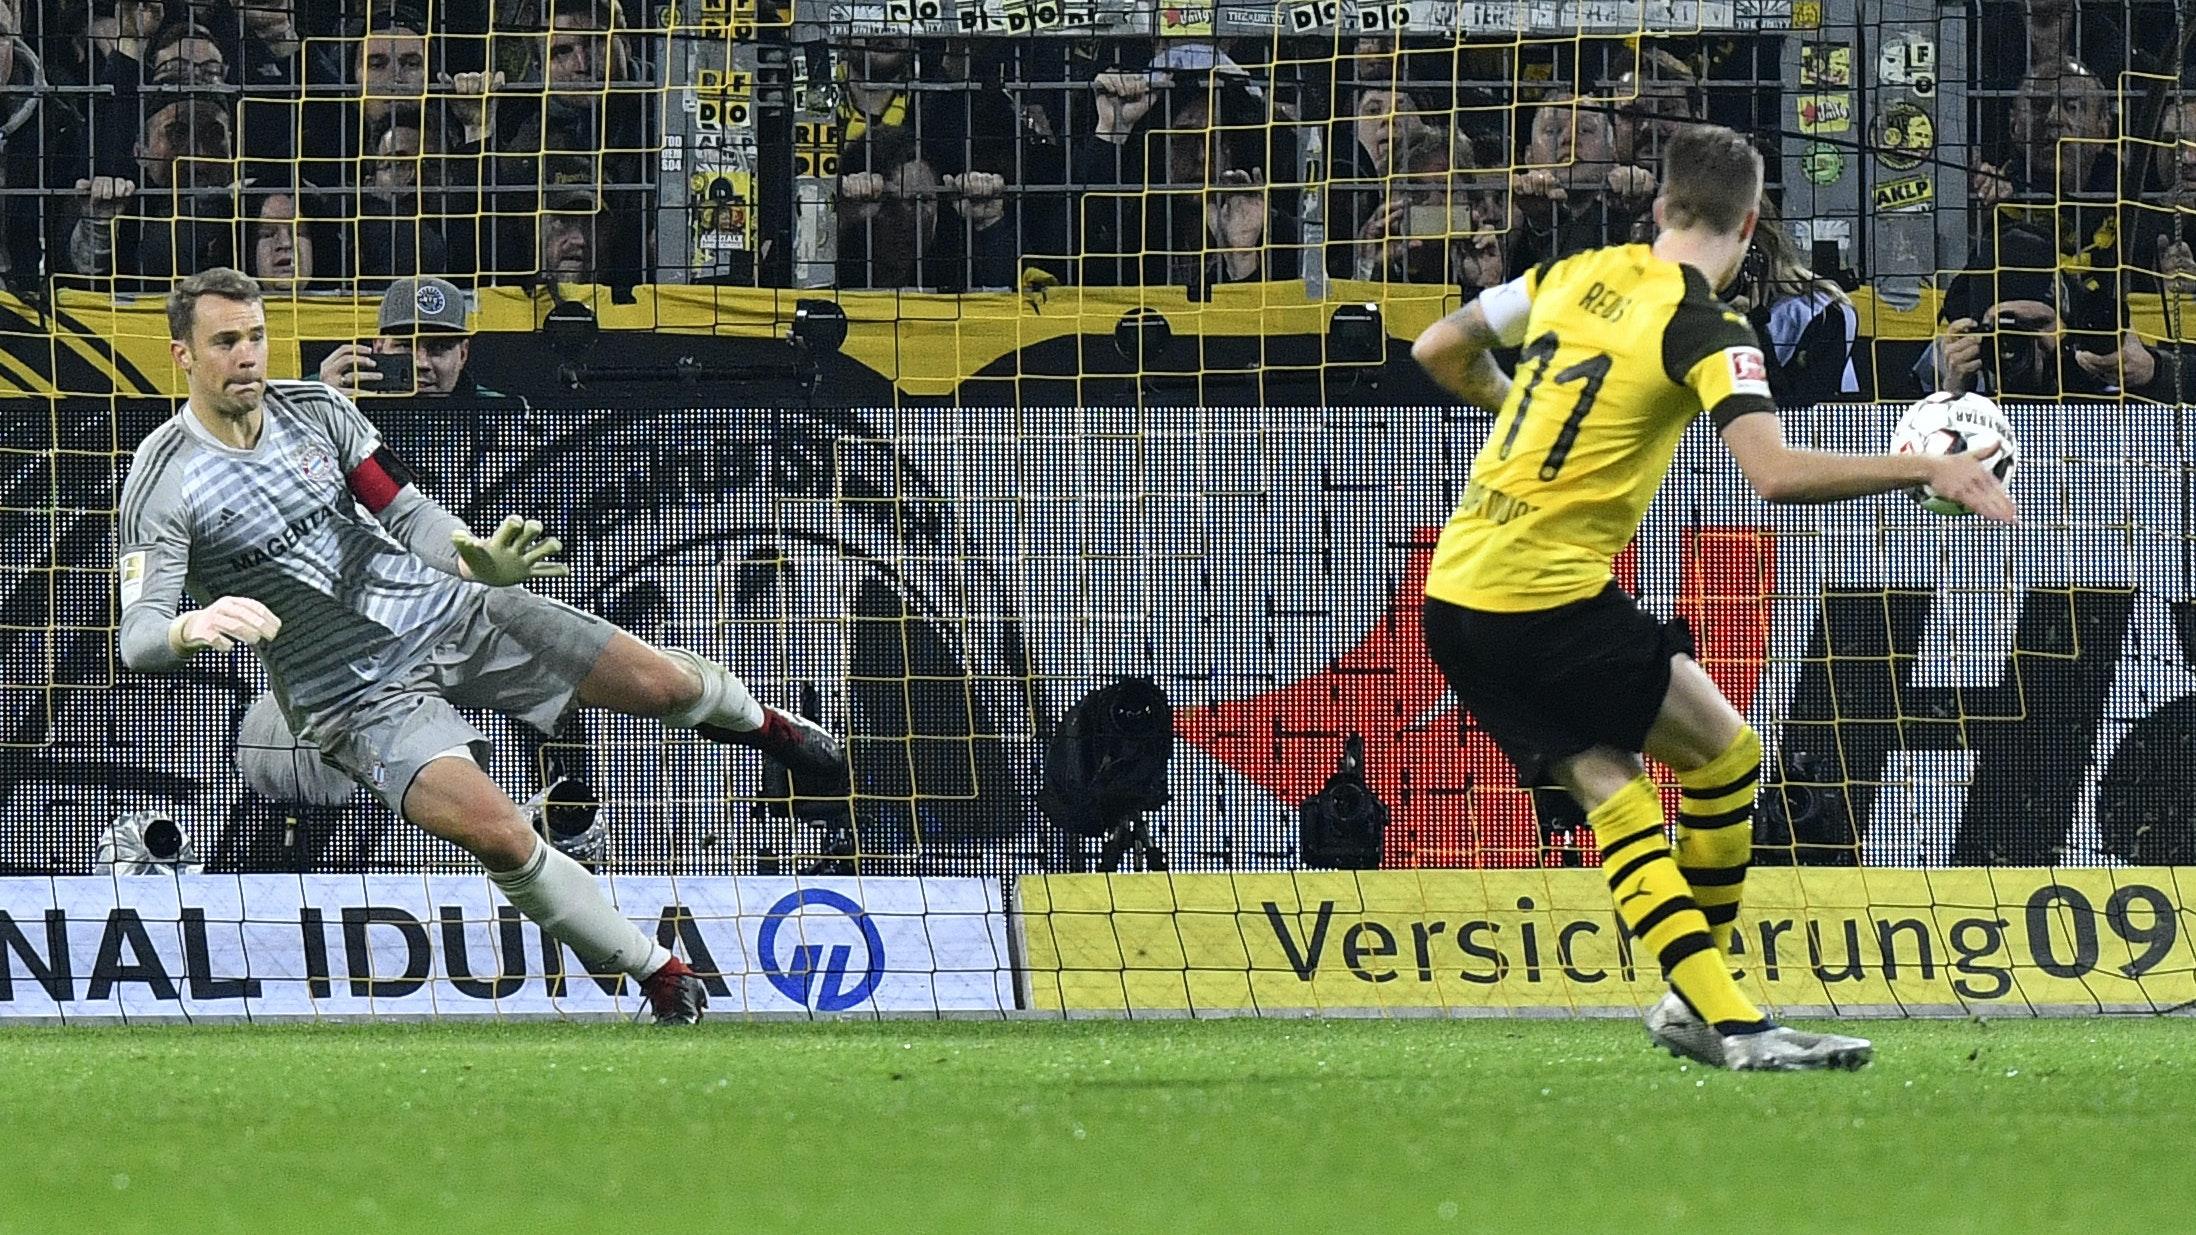 German Football Returns - How To Watch Bundesliga On TV In The UK